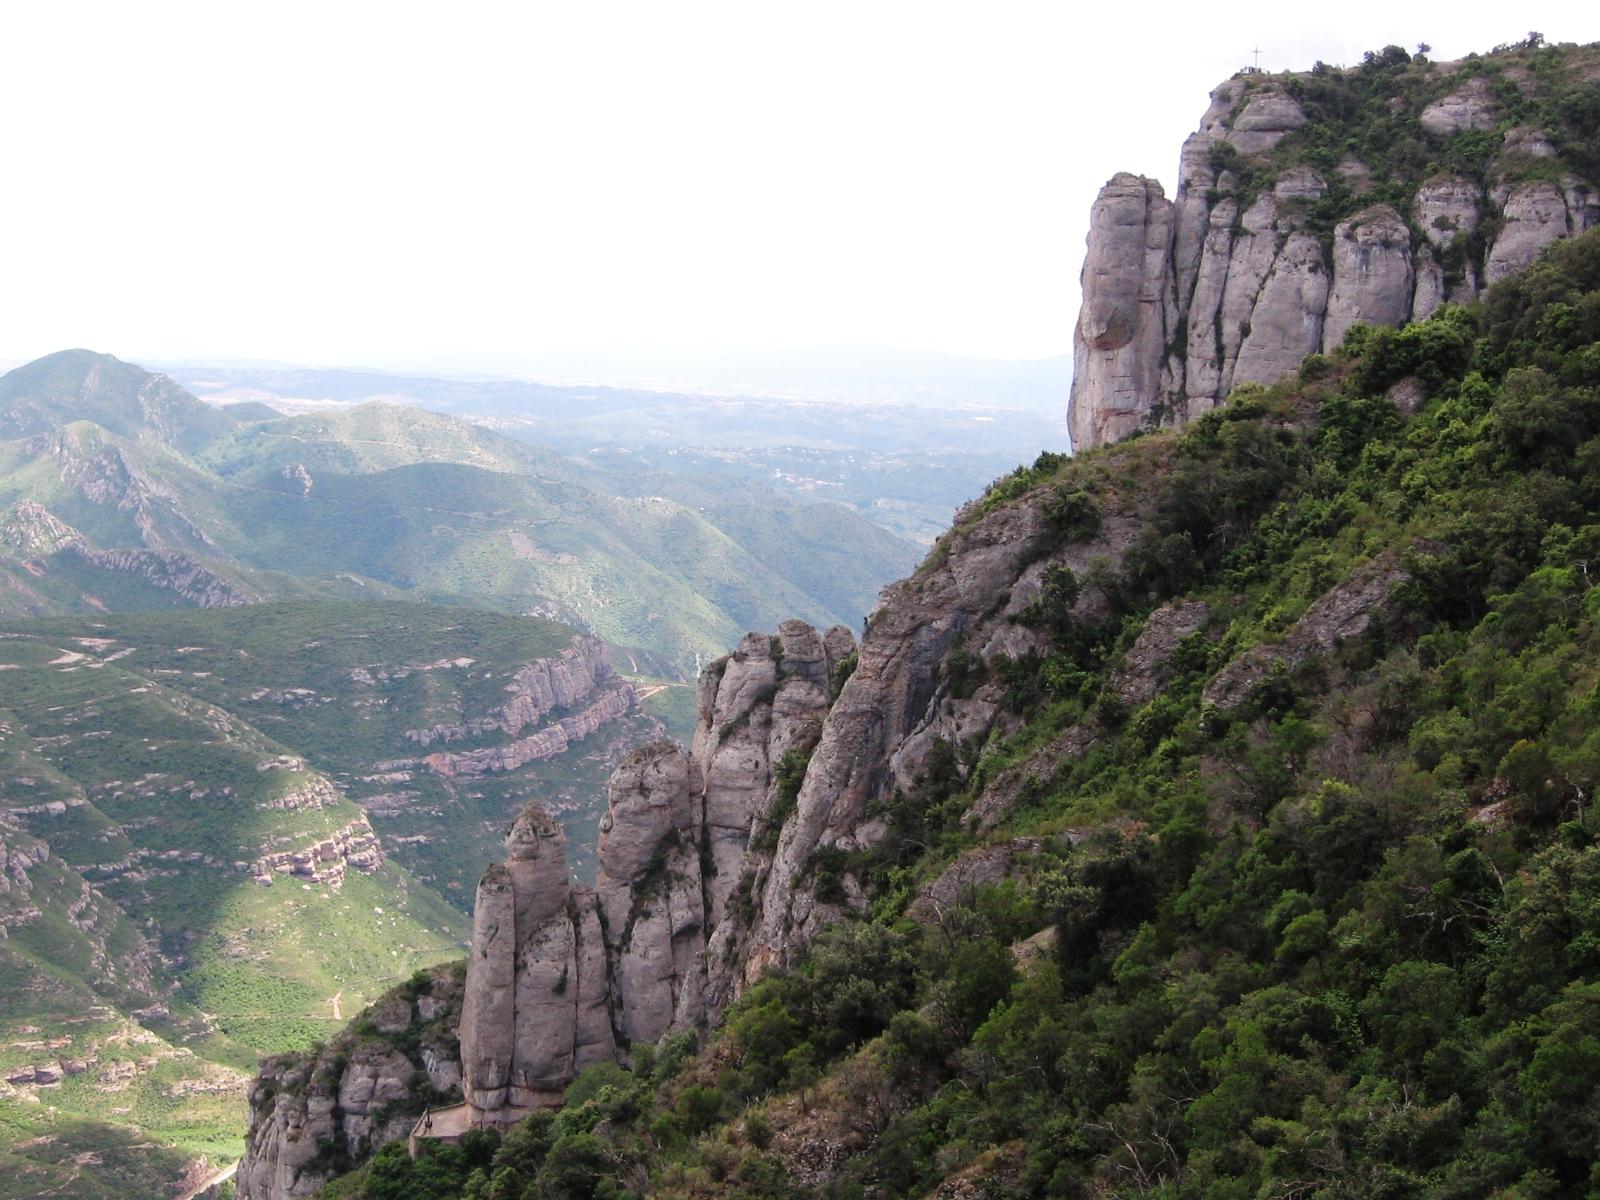 Spain Montserrat view 2009 369.jpg